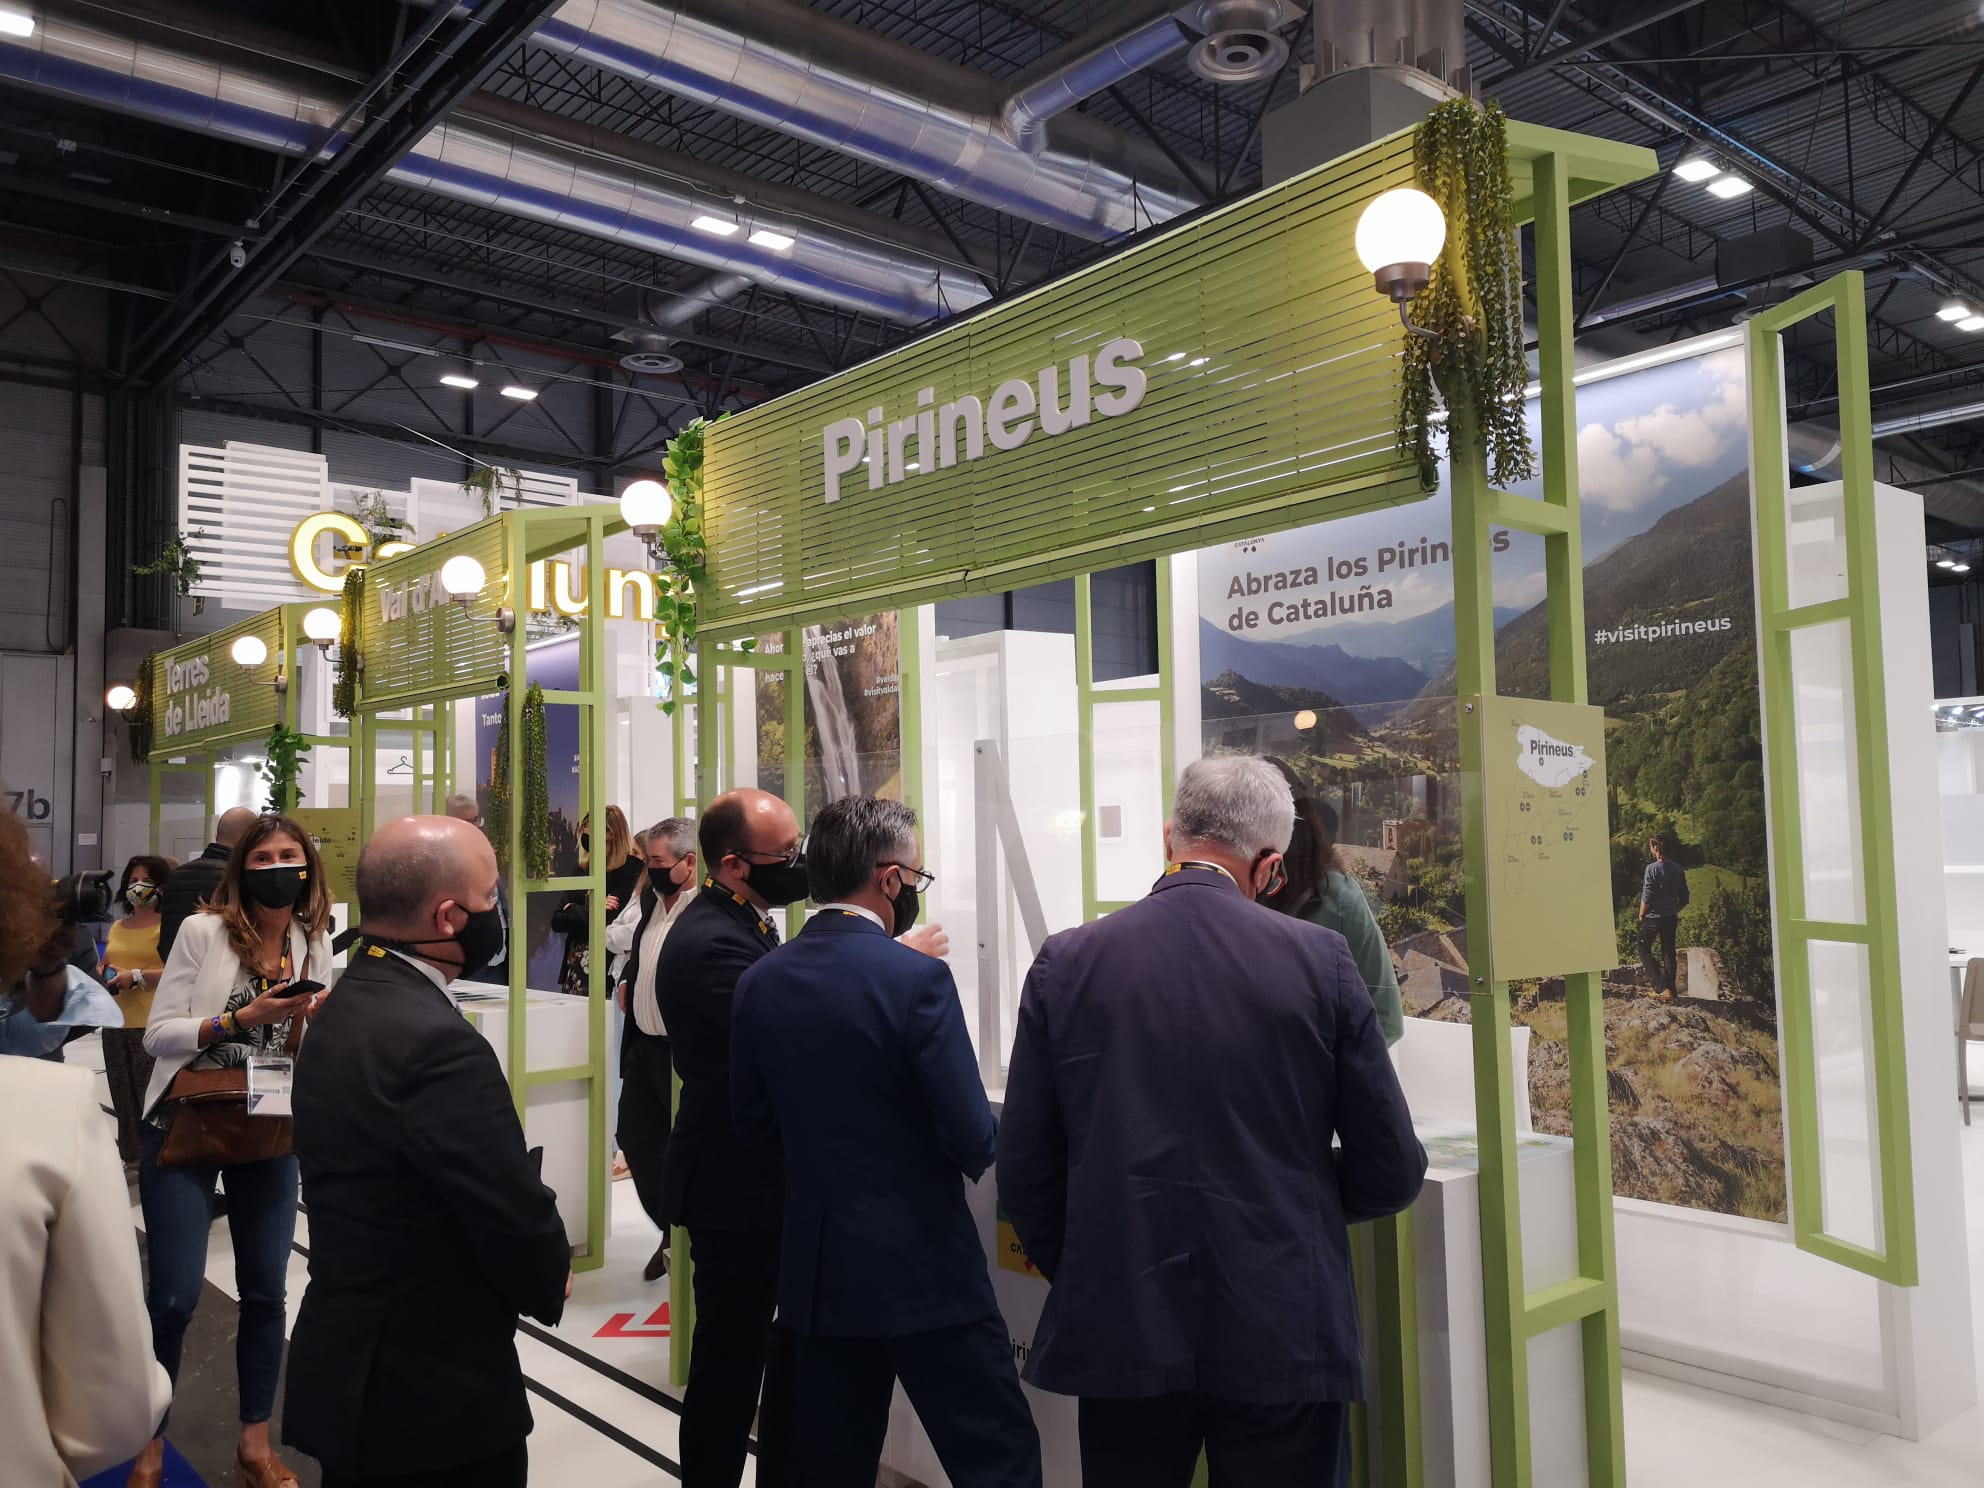 El conseller Ramon Tremosa visitant l'espai de Pirineus i Terres de Lleida